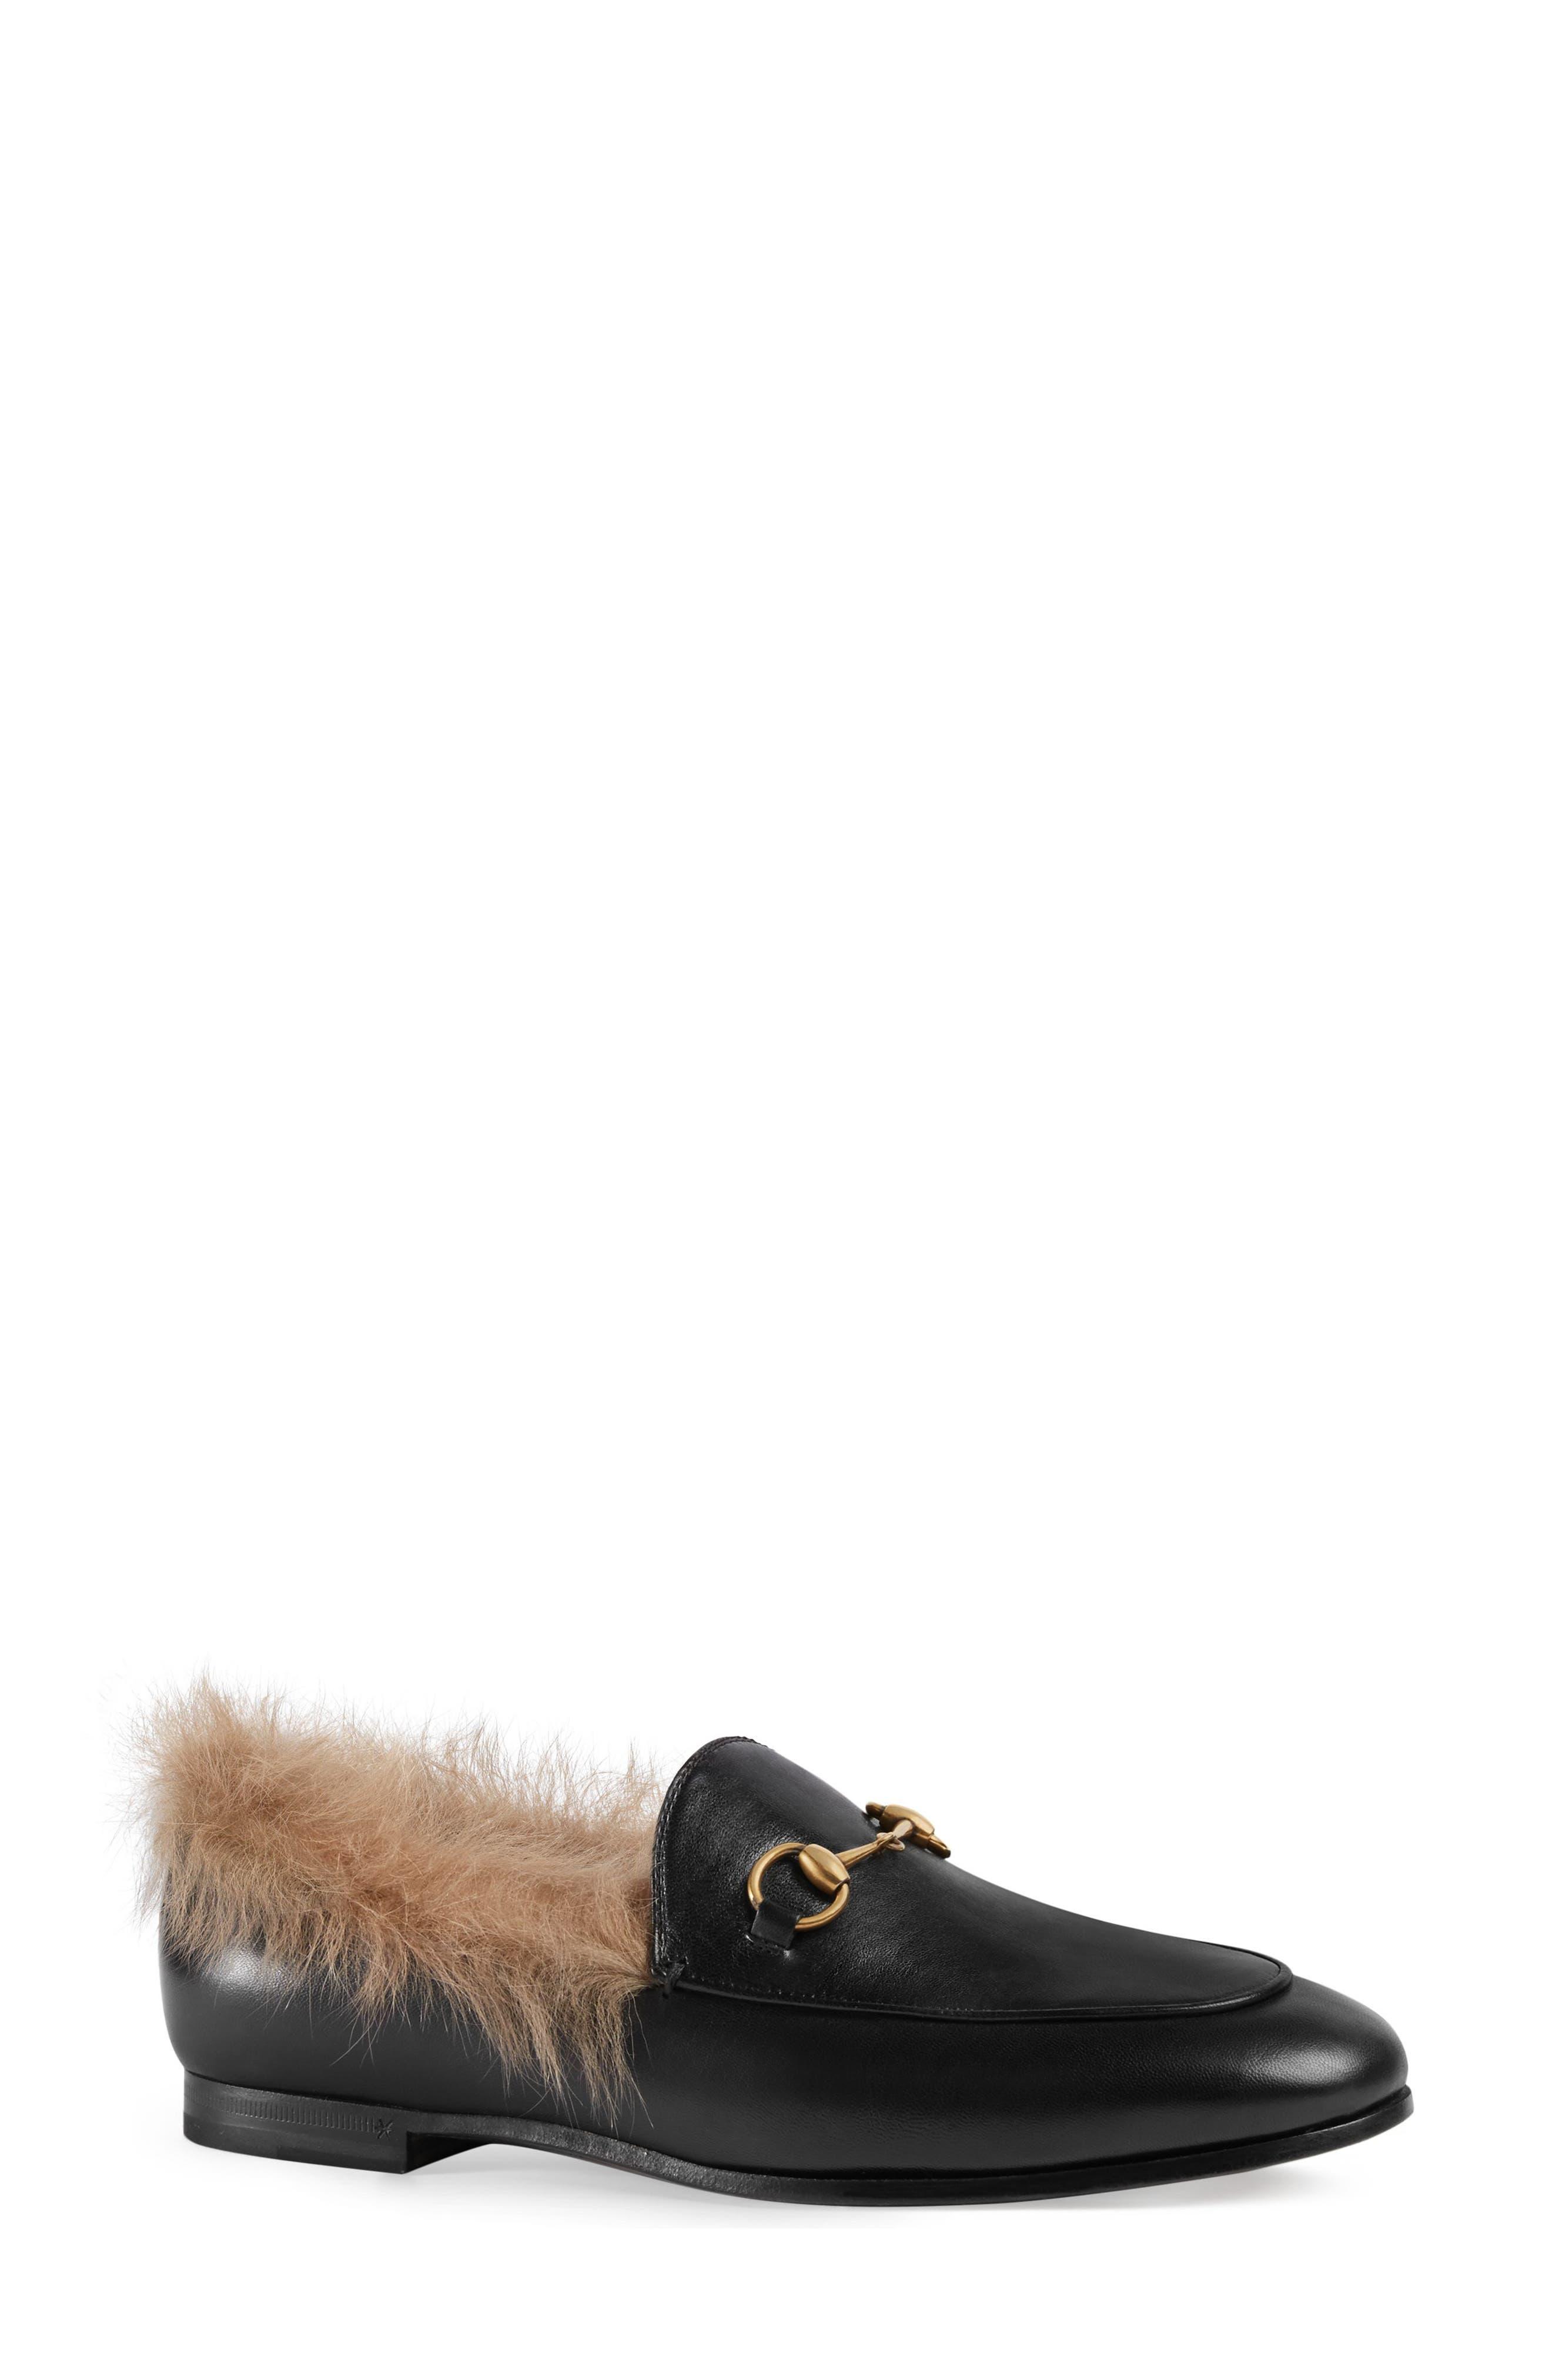 GUCCI, Jordaan Genuine Shearling Lining Loafer, Main thumbnail 1, color, BLACK